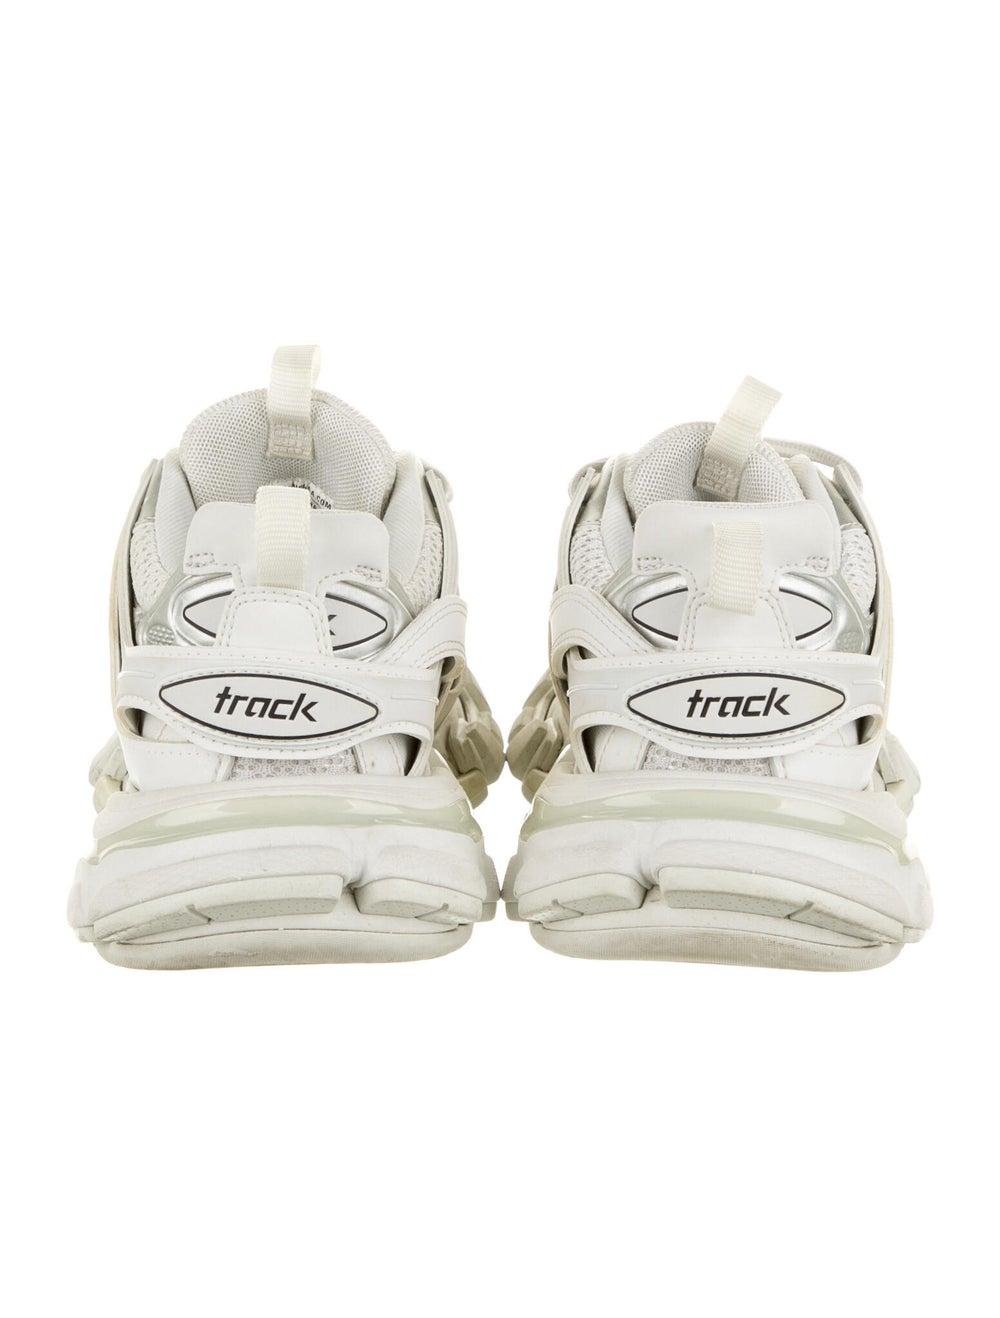 Balenciaga Track Trainer Sneakers White - image 4